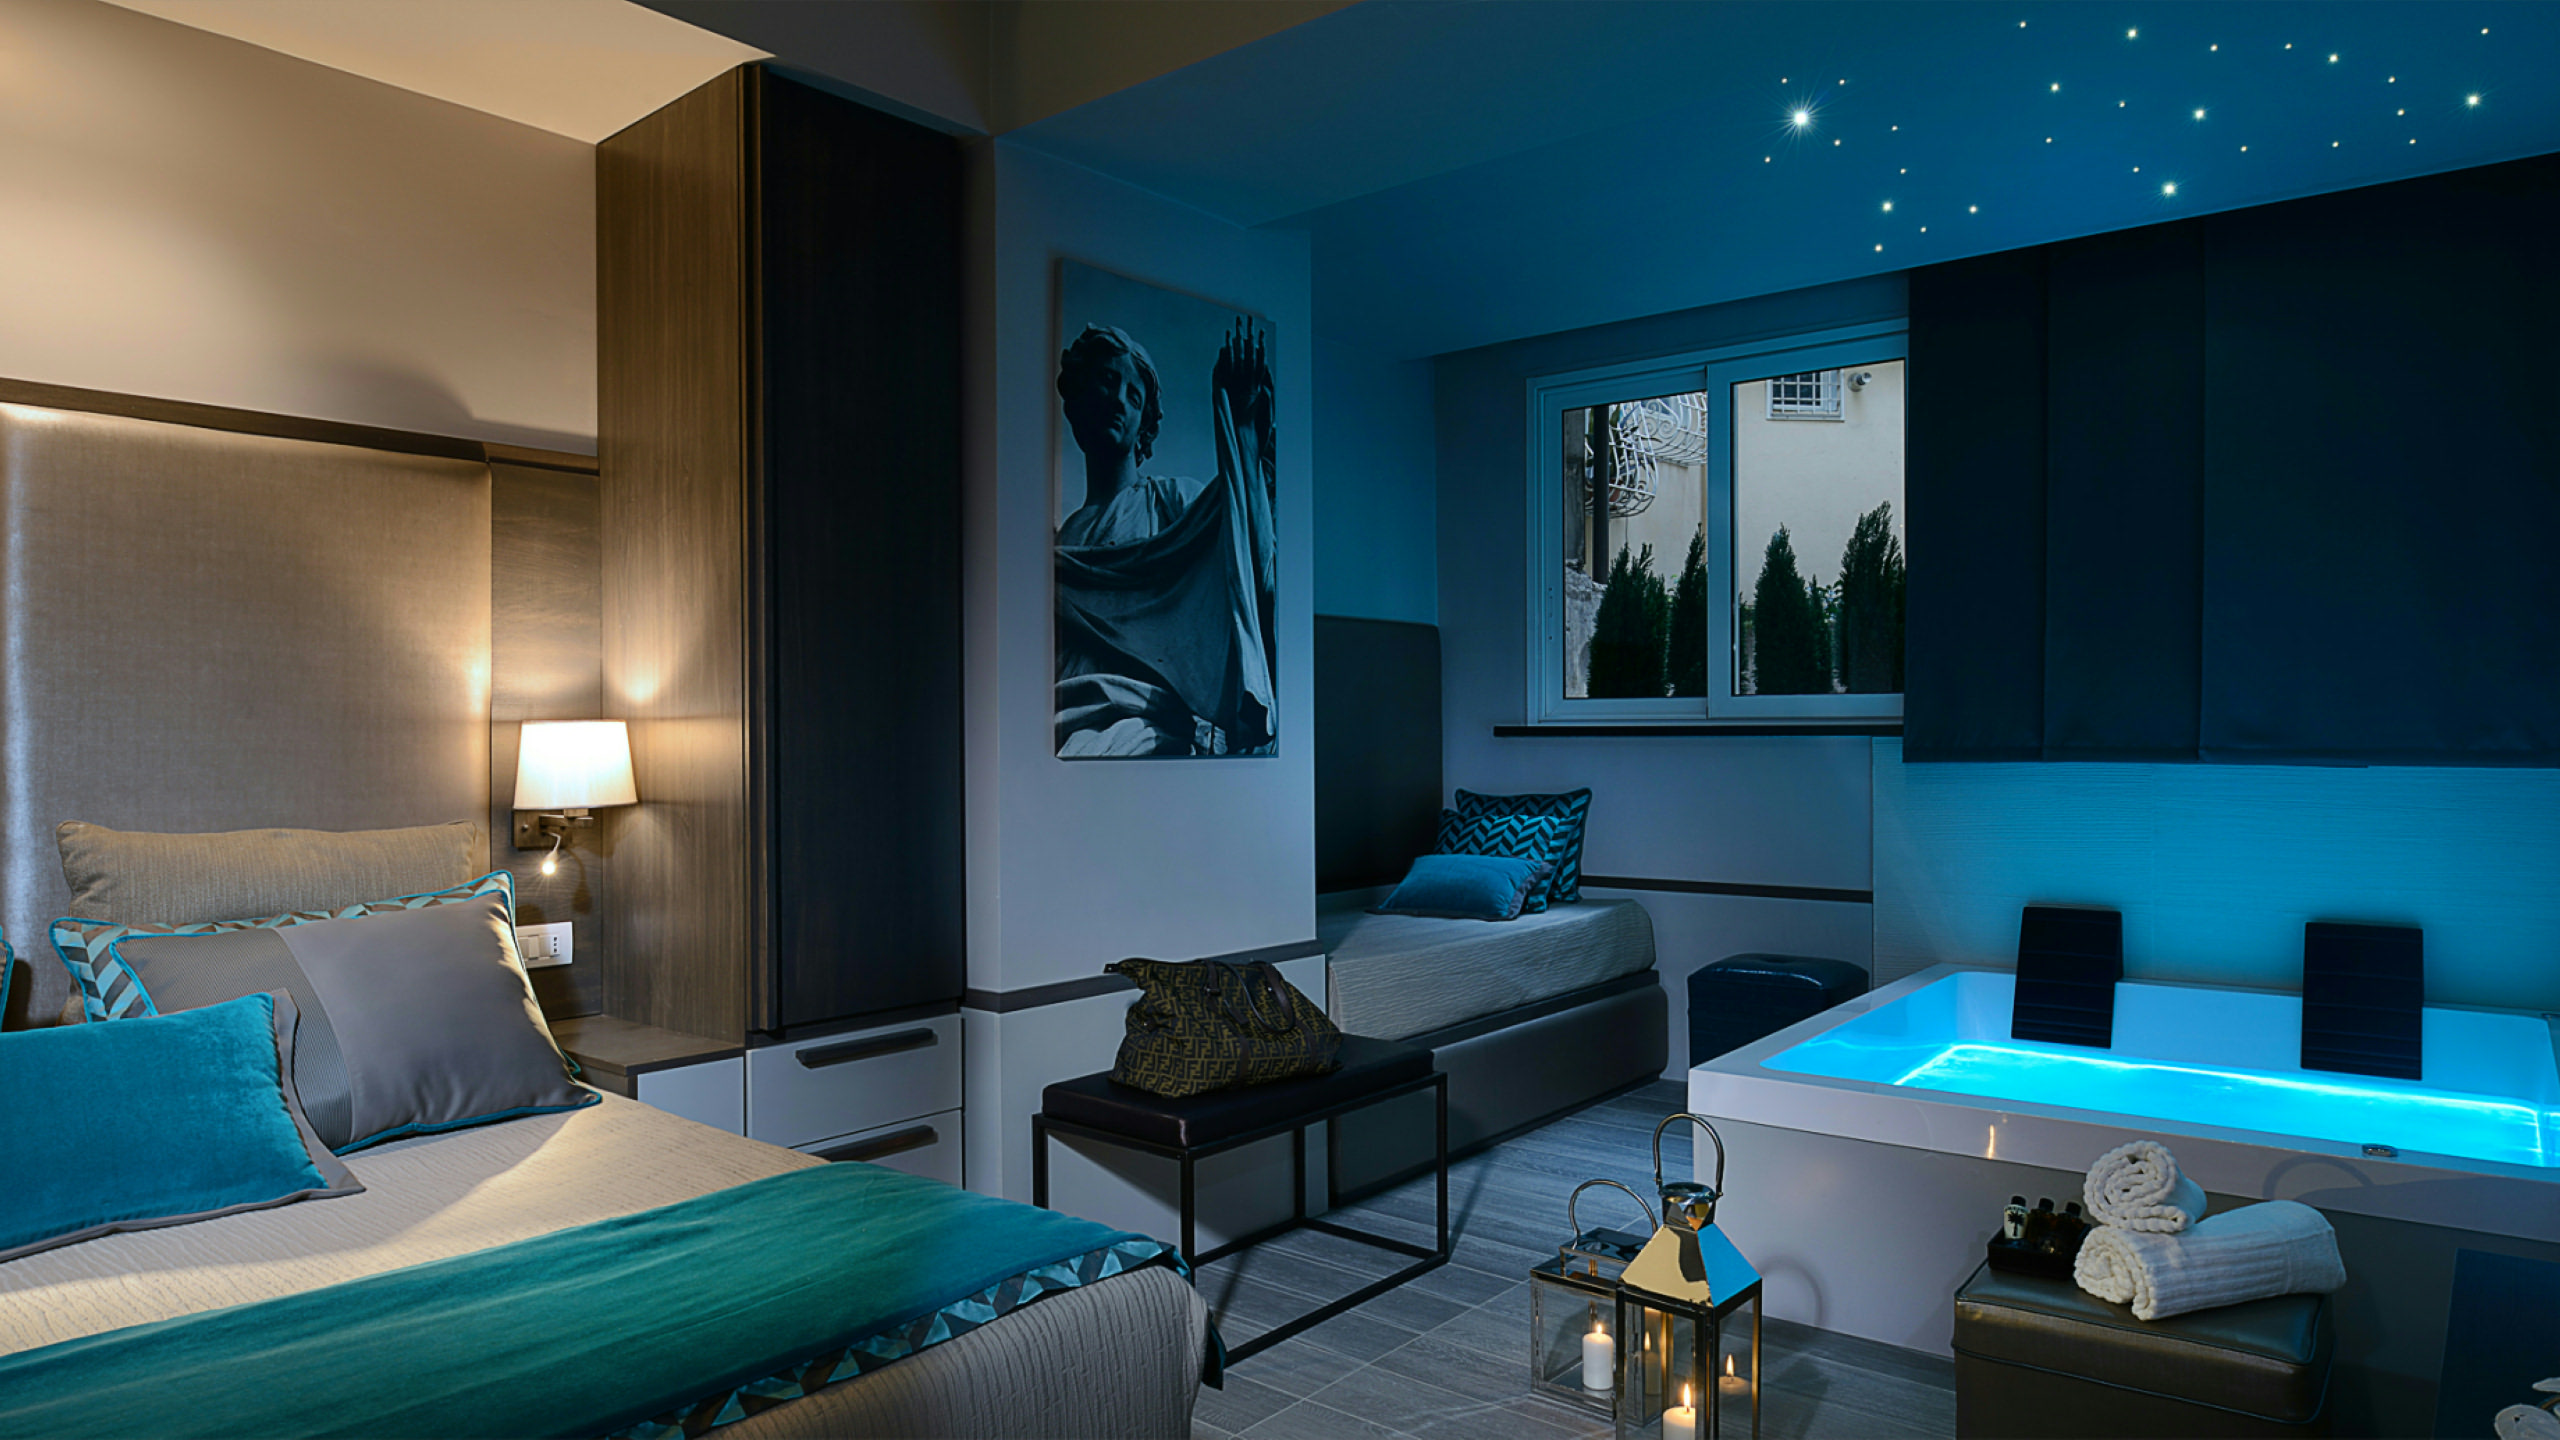 san-carlo-suite-rome-exclusive-14959